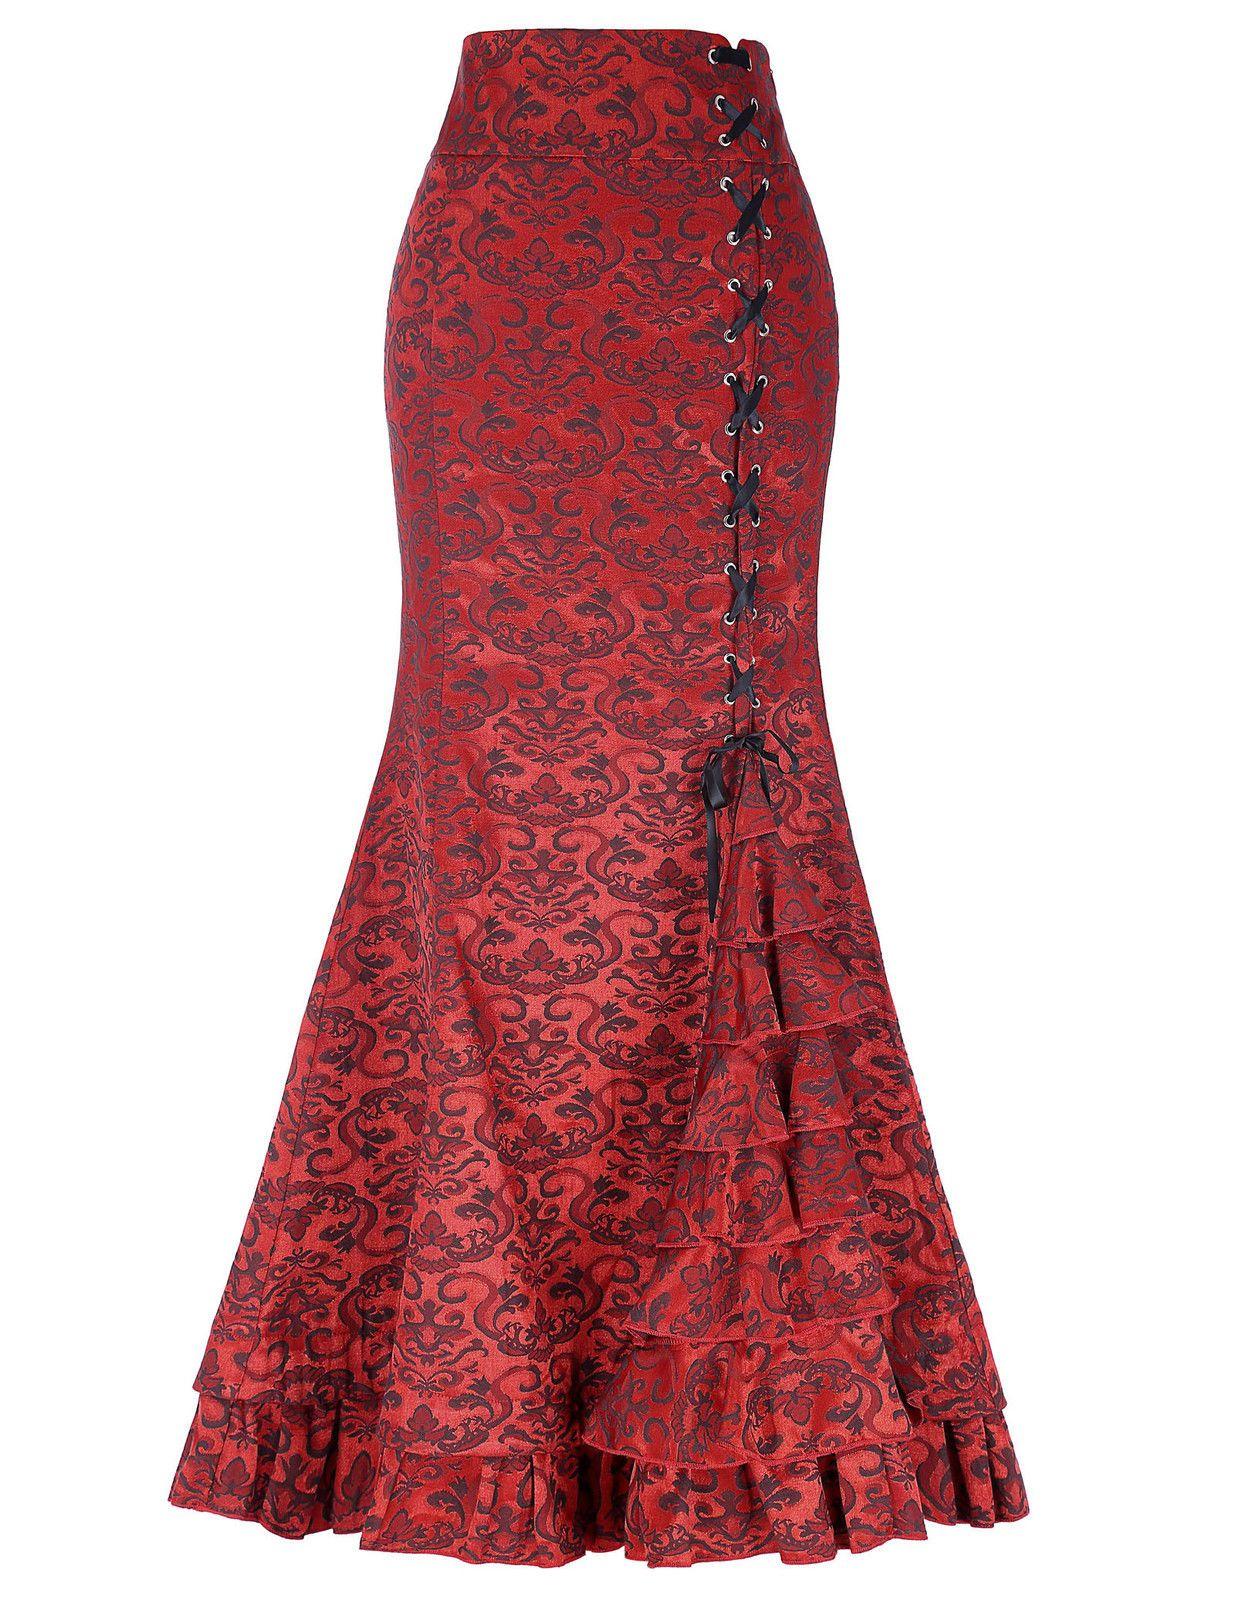 2c4705de03 Women Gothic Long Steampunk Skirt Mermaid Maxi Fishtail Victorian Skirt 4  Colors | eBay